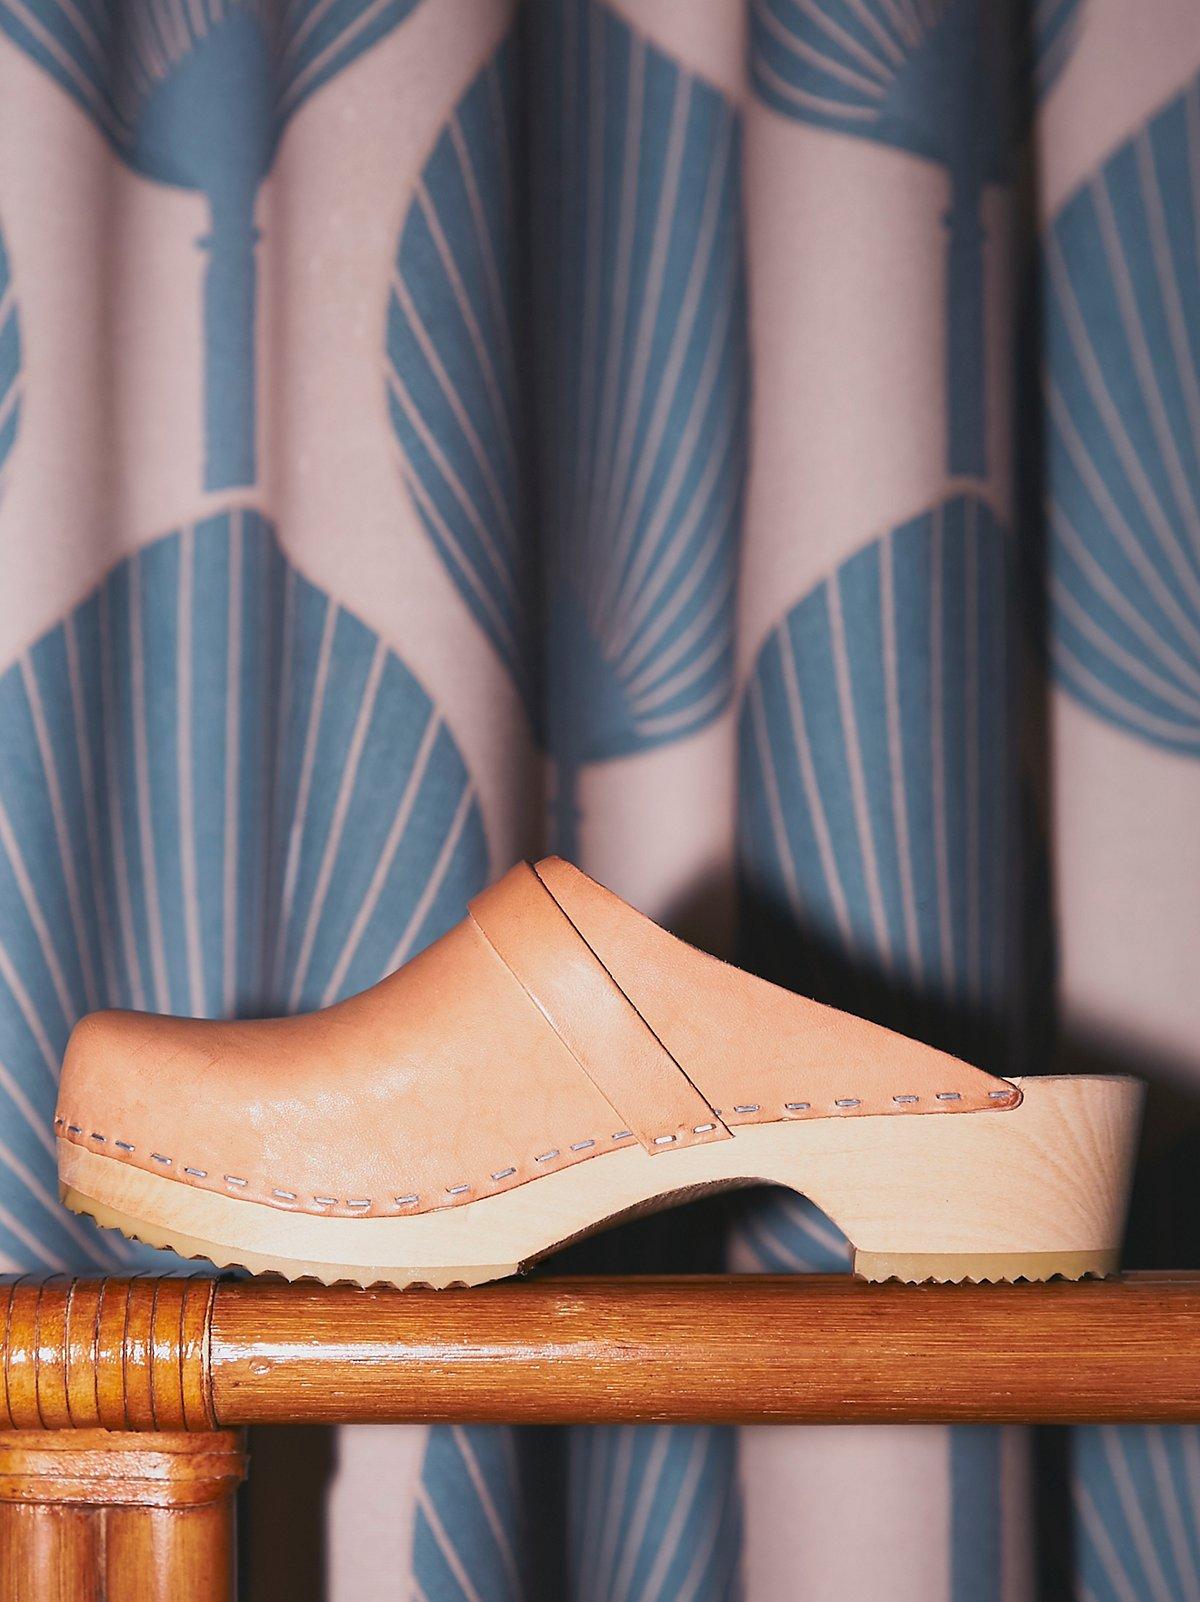 Husband木底鞋